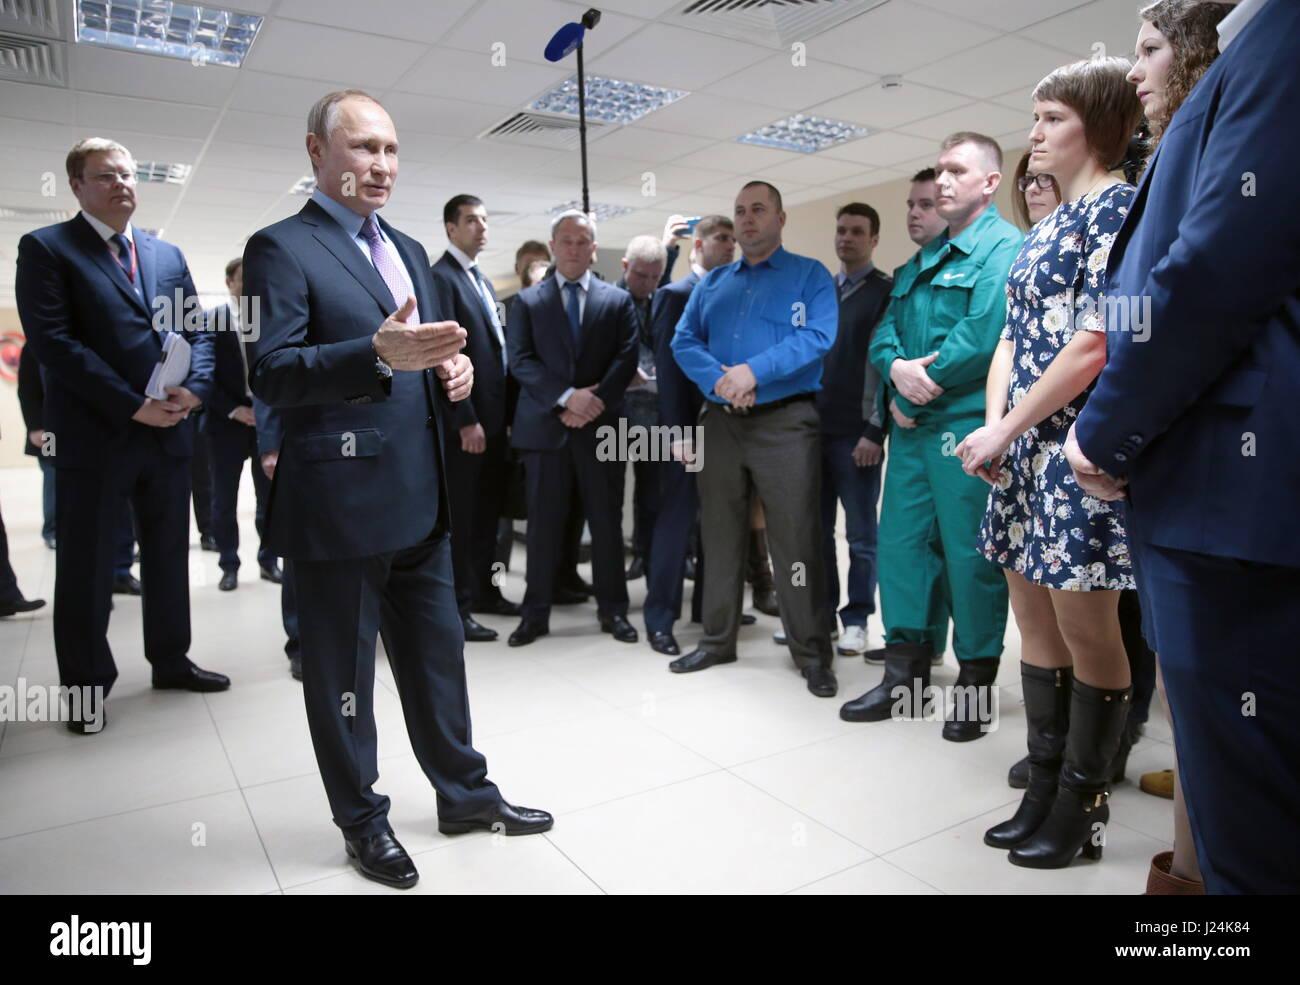 Yaroslavl Region, Russia. 25th Apr, 2017. Russia's President Vladimir Putin (L front) talks to NPO Saturn employees - Stock Image